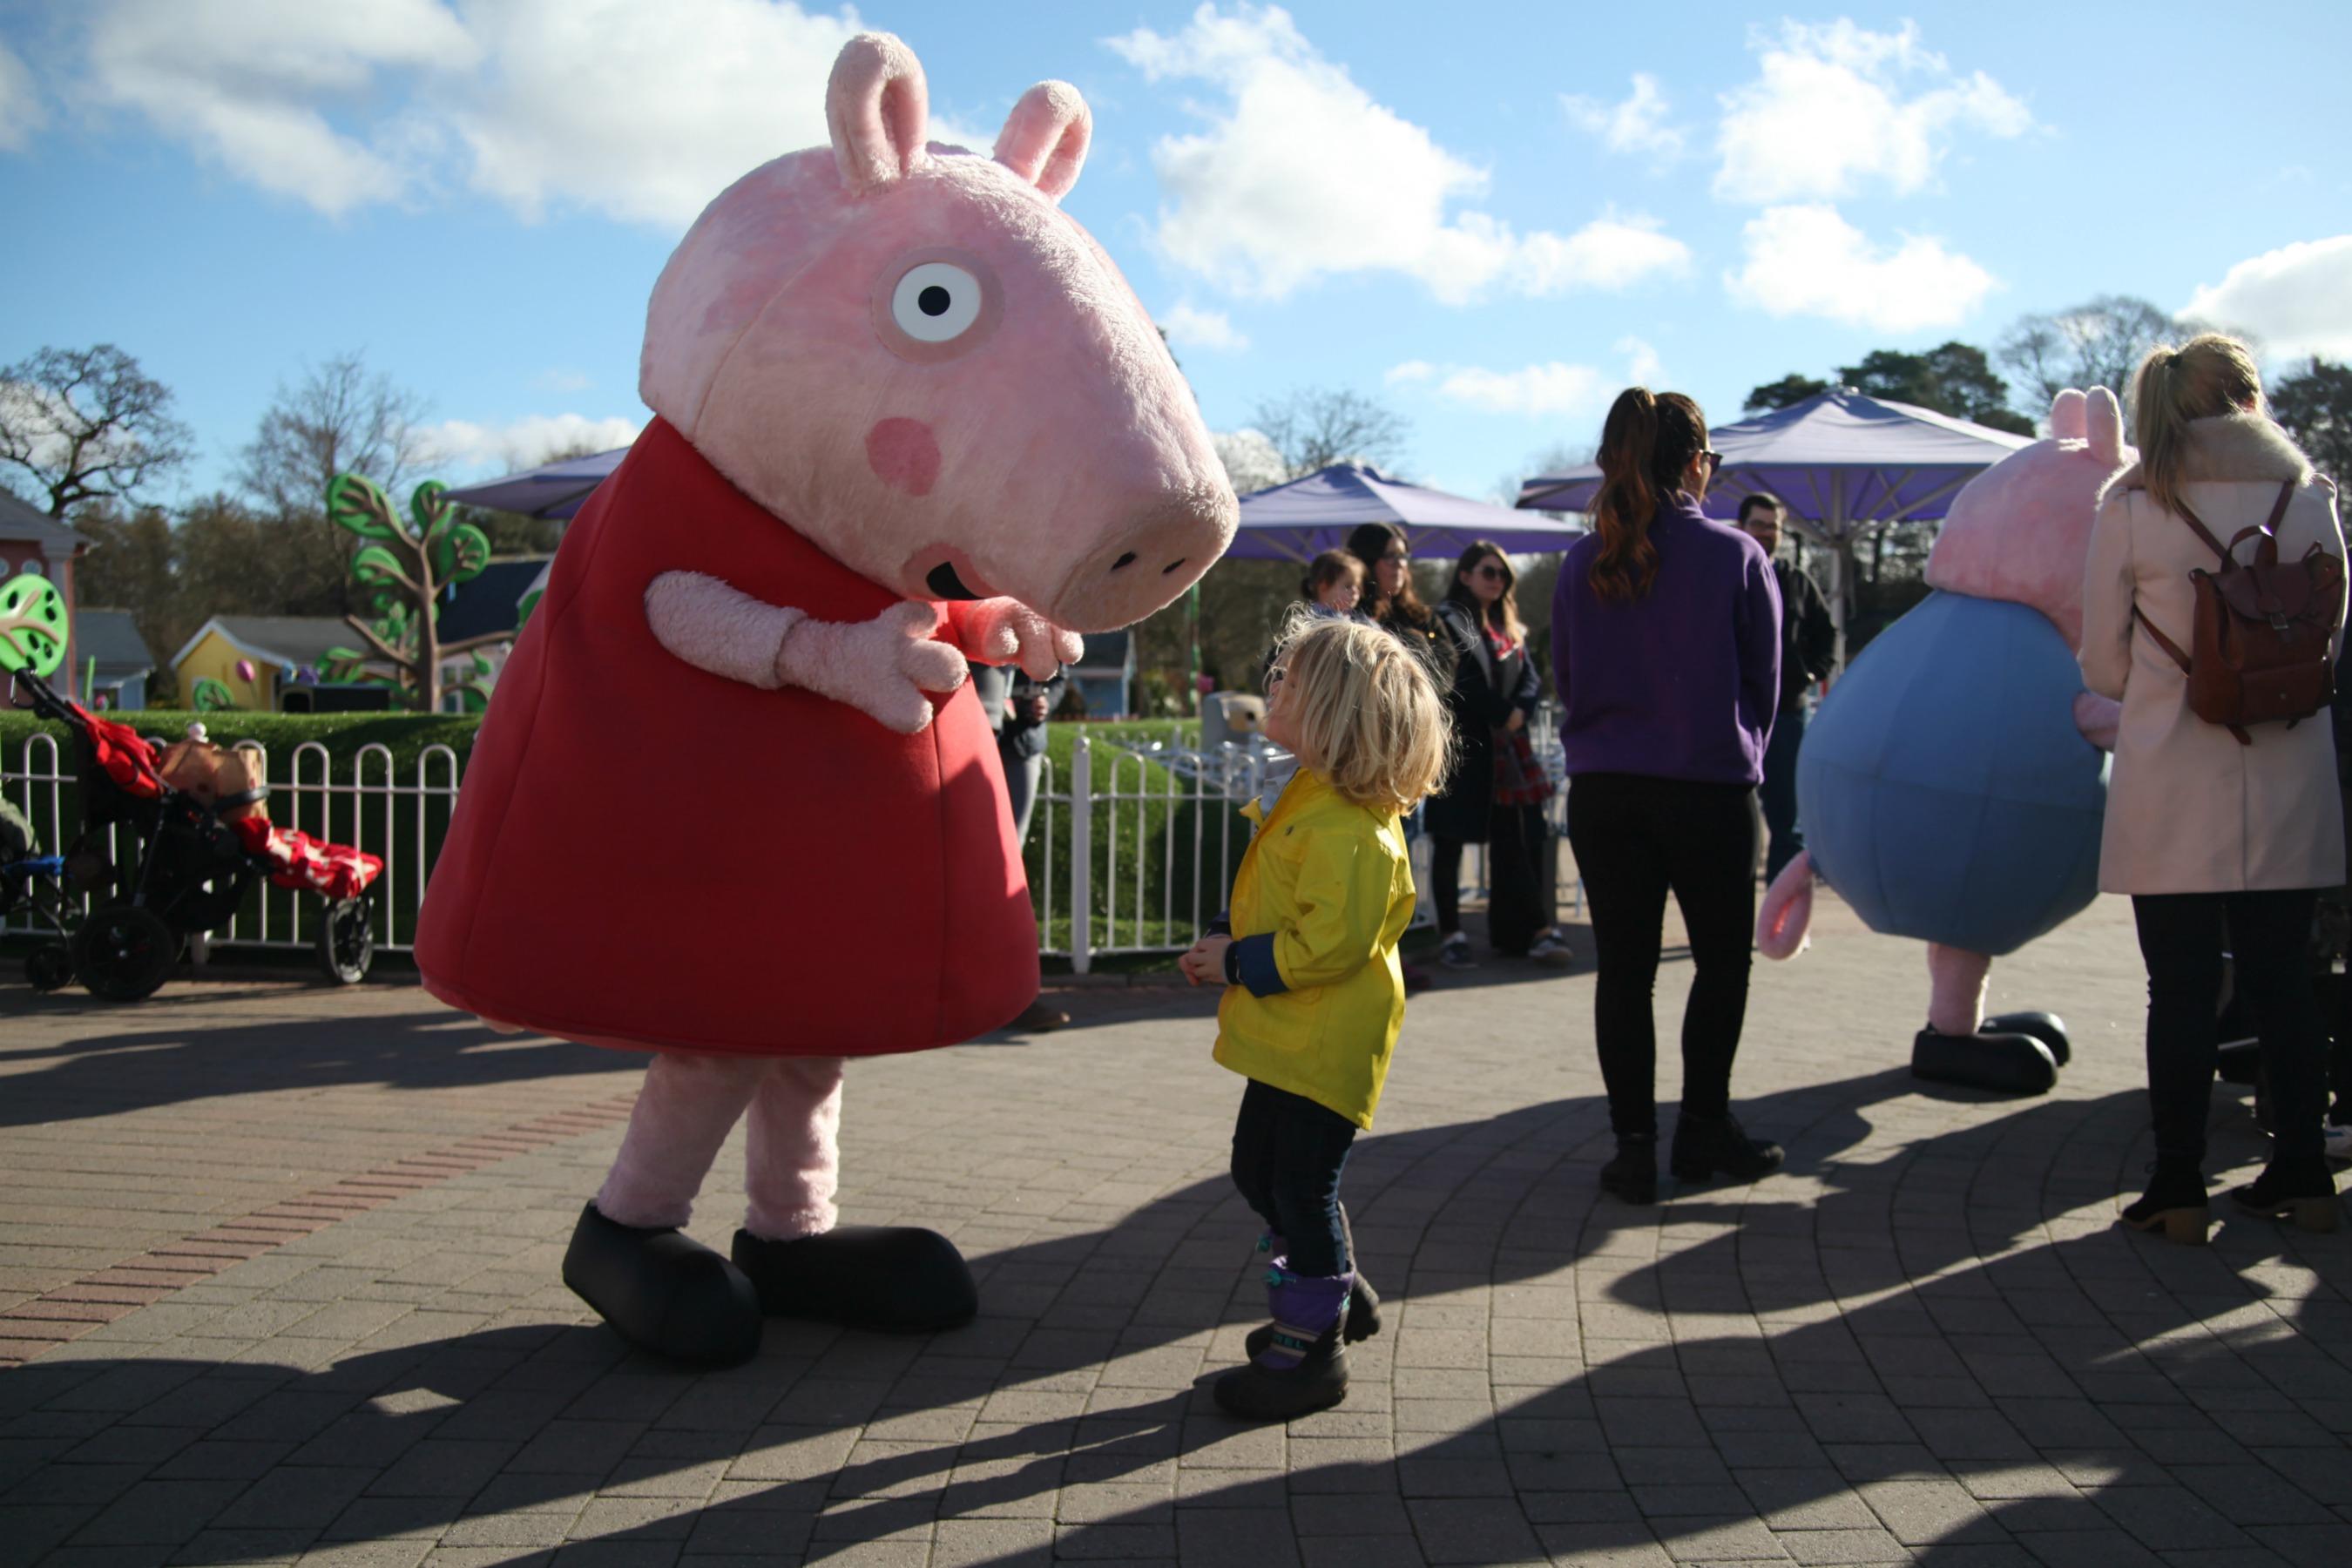 Meeting Peppa Pig at Paulton's Park and join the Muddy Puddles Walk